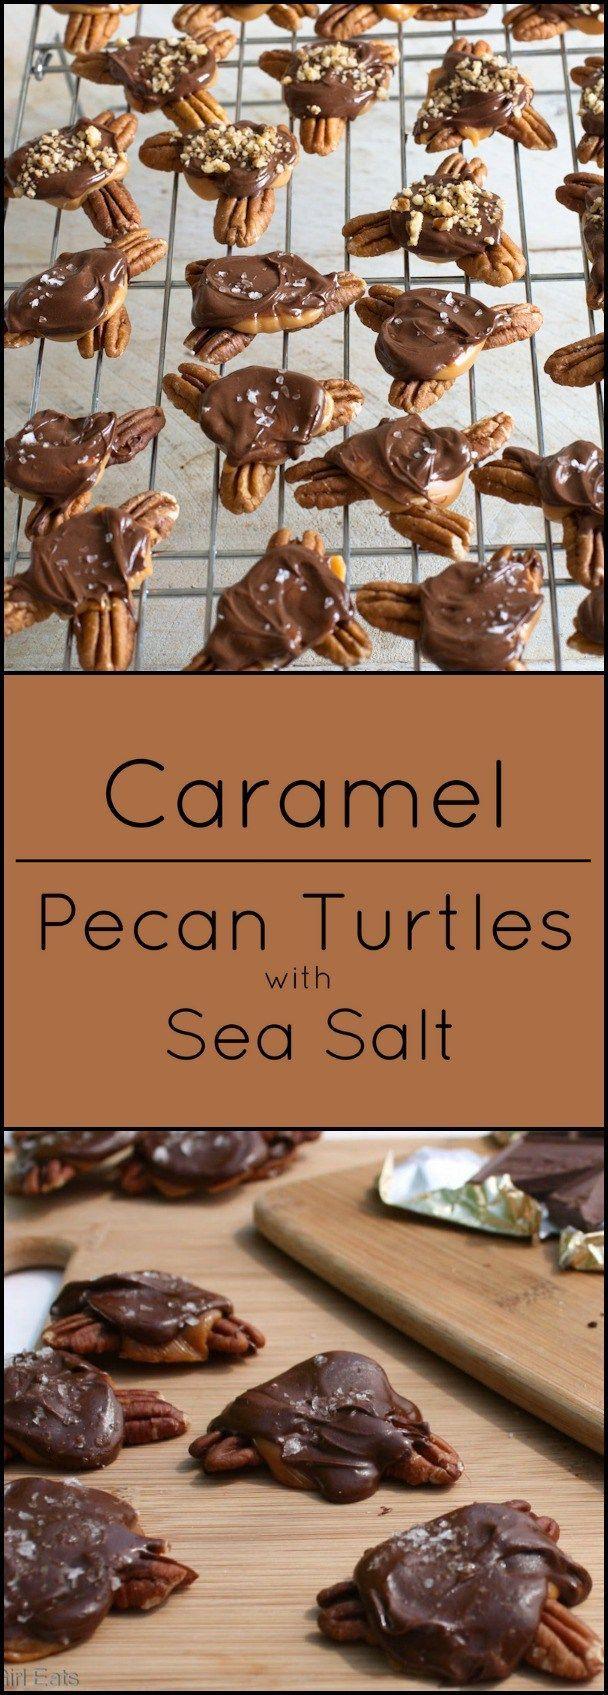 Gluten free Caramel Pecan Turtles with Sea Salt.